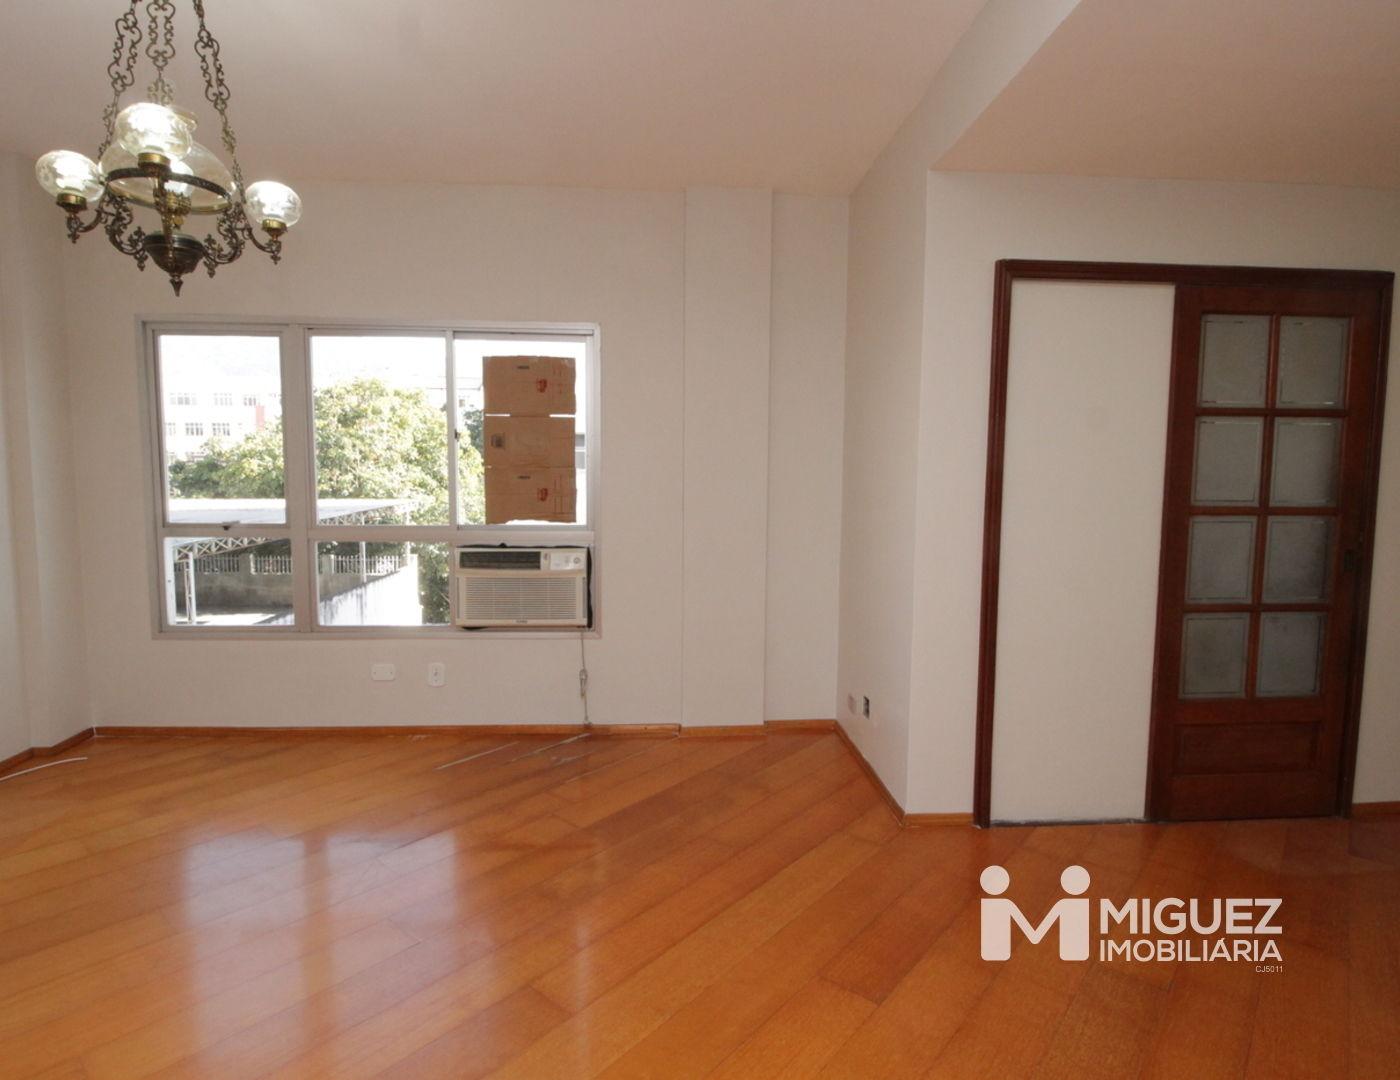 Apartamento, aluguel, Rua Gonzaga Bastos - Vila Isabel , Rio de janeiro